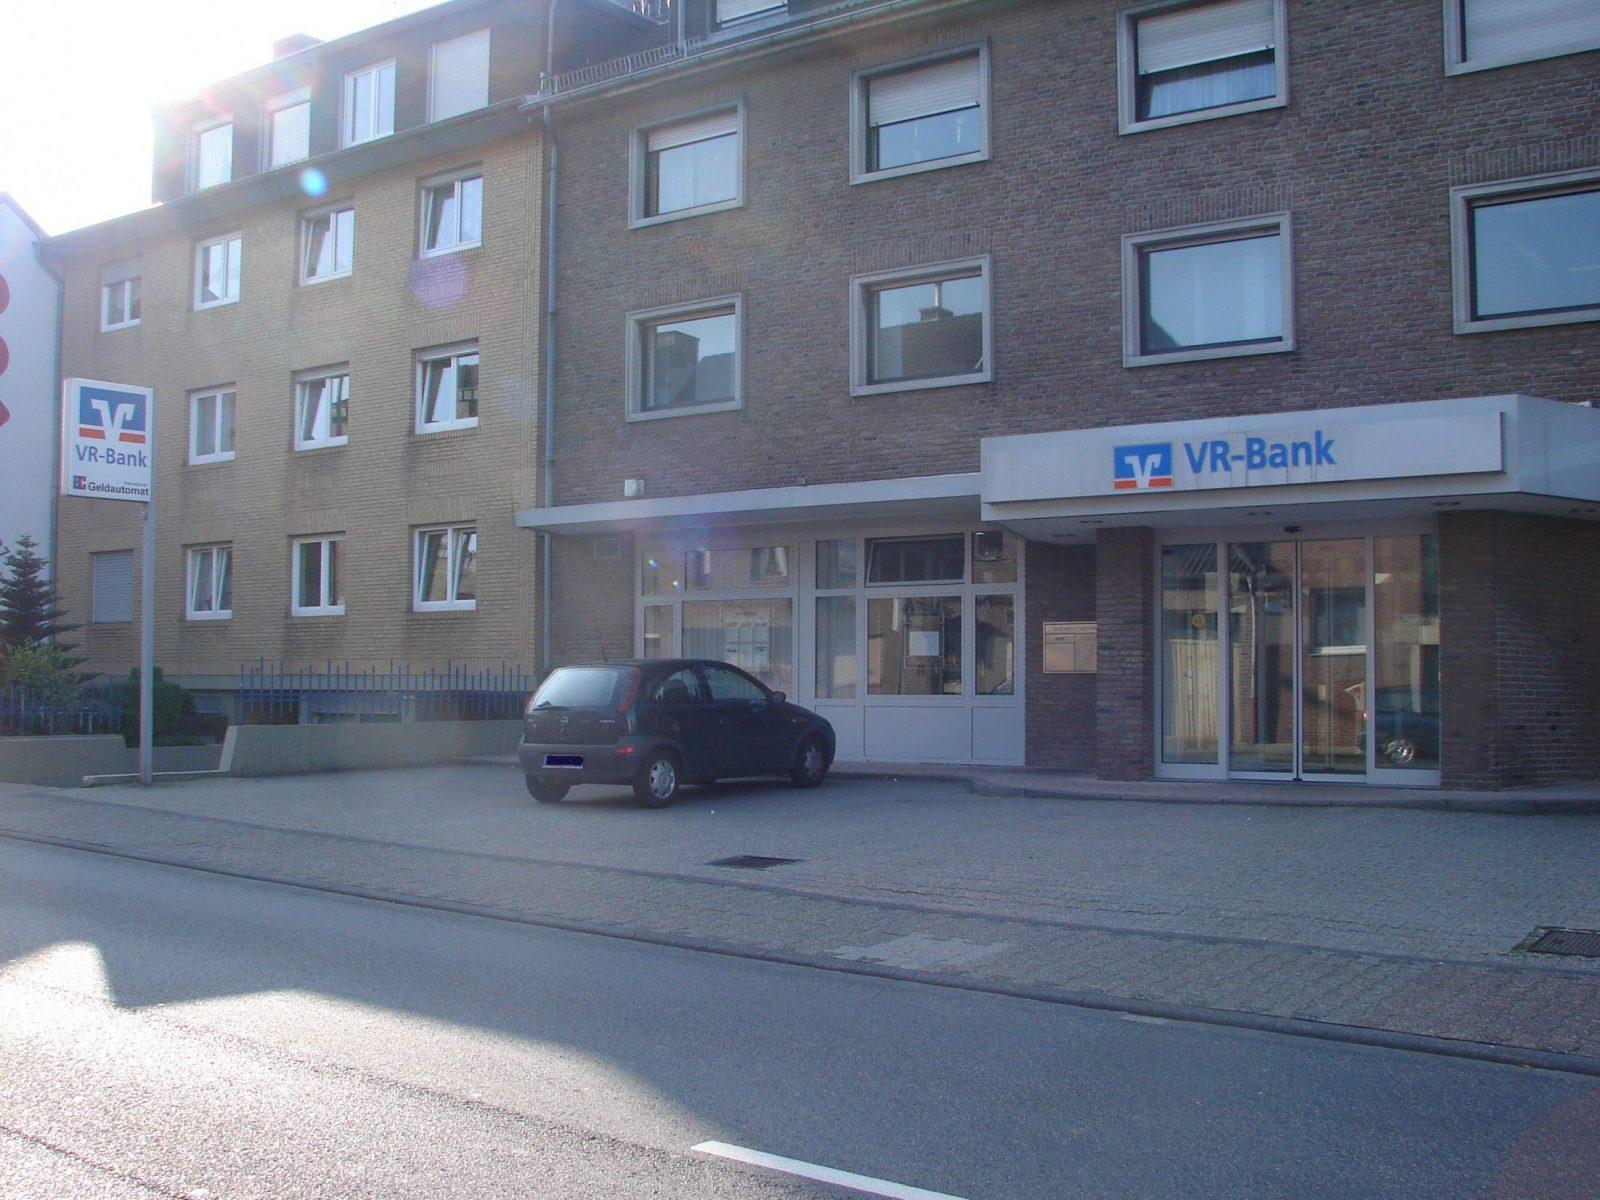 Vrbank Eg  Region Aachen Geldautomat Lindenneusen  Banken von Vr Bank Eg Region Aachen Hauptstelle Würselen Bild